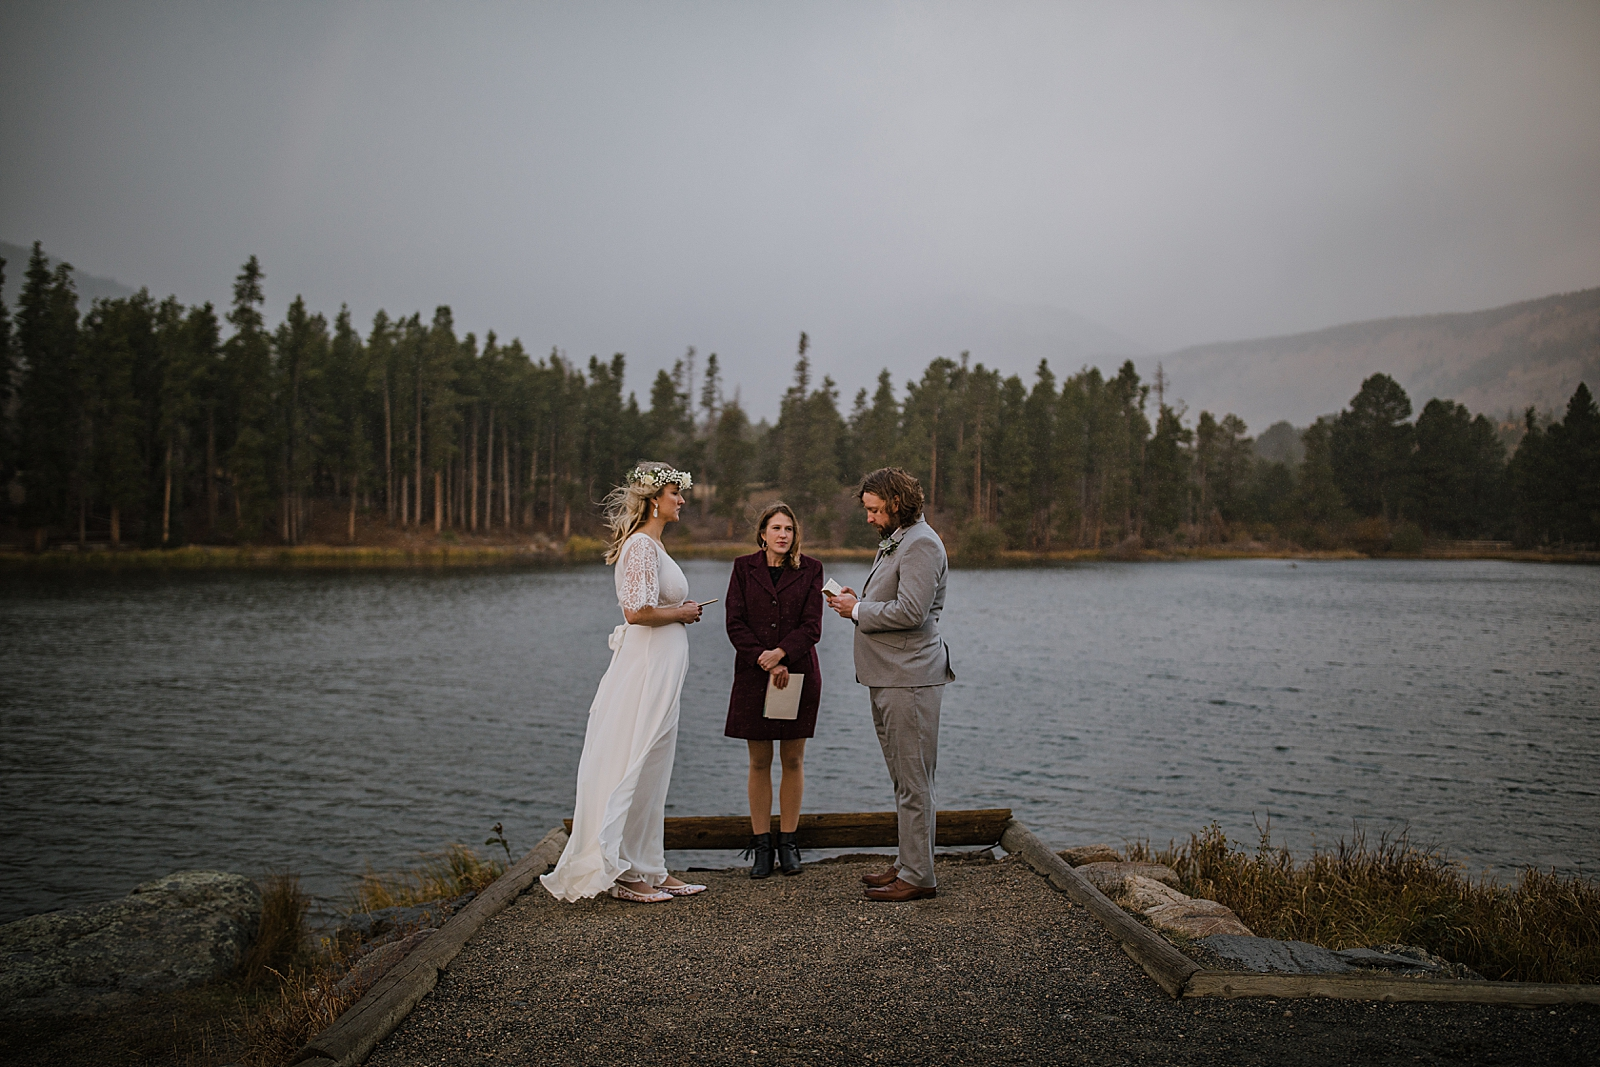 bride and groom vows, sprague lake dock elopement, sunrise elopement, colorado elopement, sprague lake elopement, rocky mountain national park elopement, adventurous colorado hiking elopement